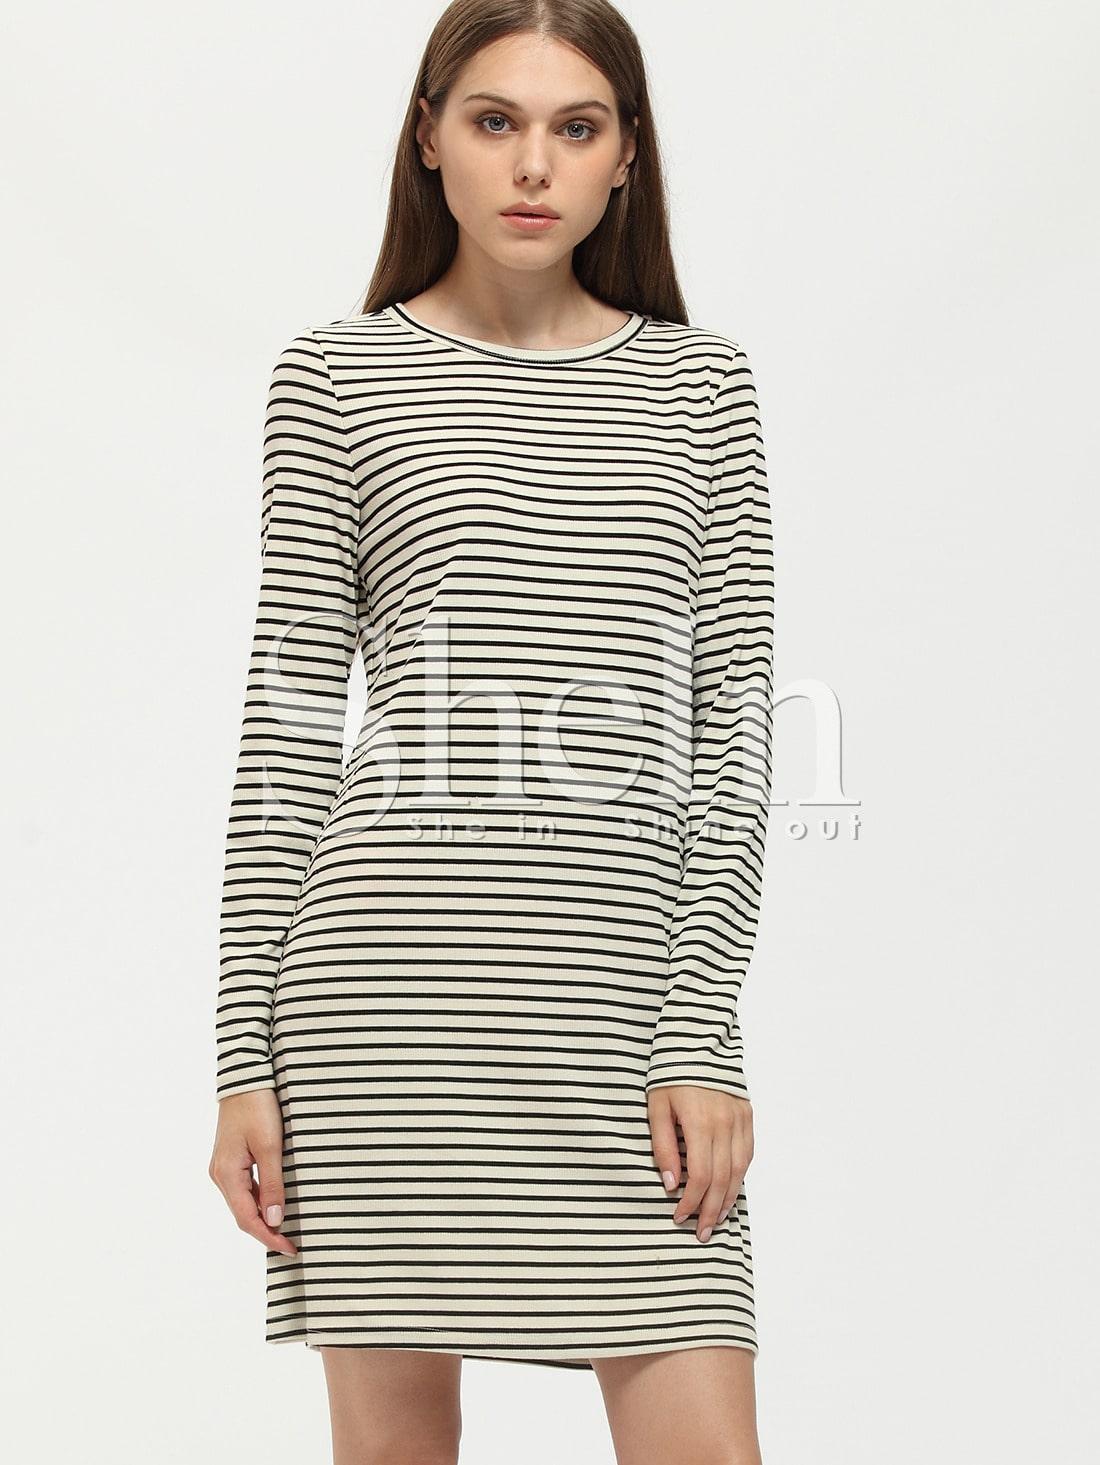 Black and White Striped Crew Neck Tshirt Dress